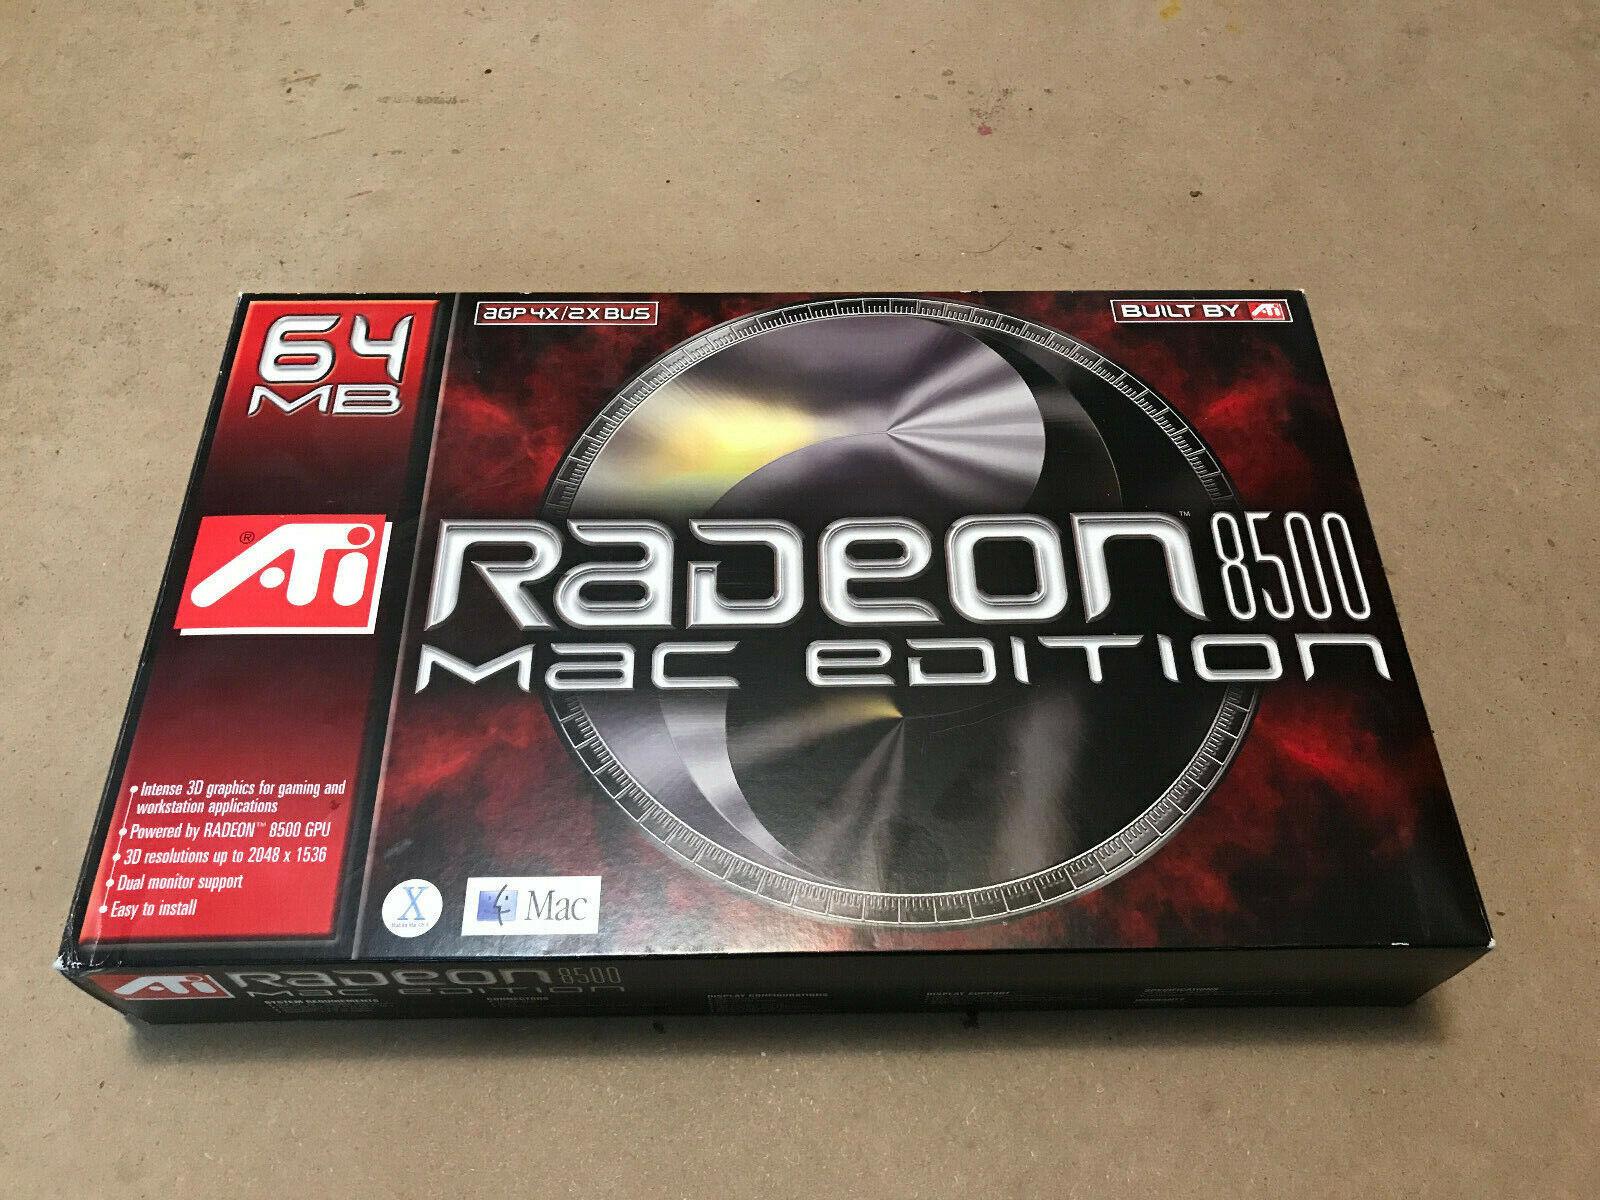 ATI Technologies ATI Radeon 8500 (100431050) 64 MB DDR SDRAM AGP 4x/8x Multi-mon